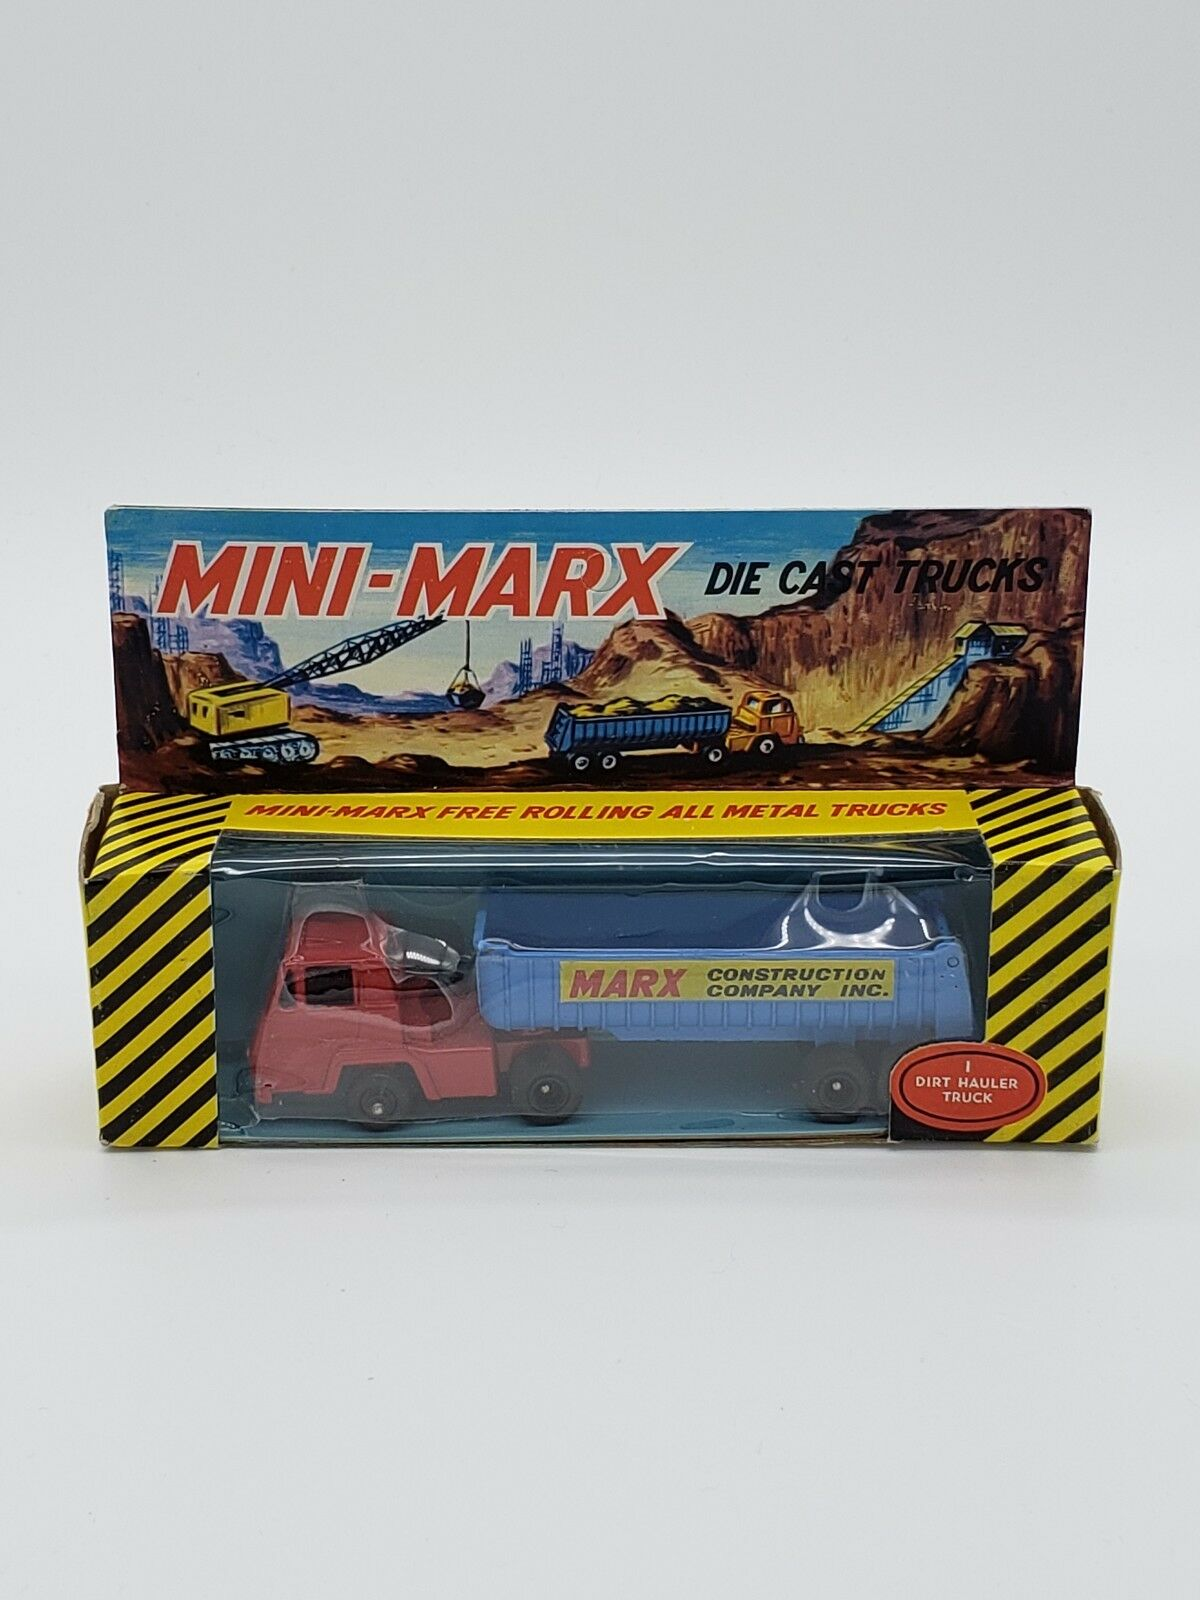 Vintage Mini Marx Die Cast Truck Marx Construction Company Dirt Hauler Truck CIB